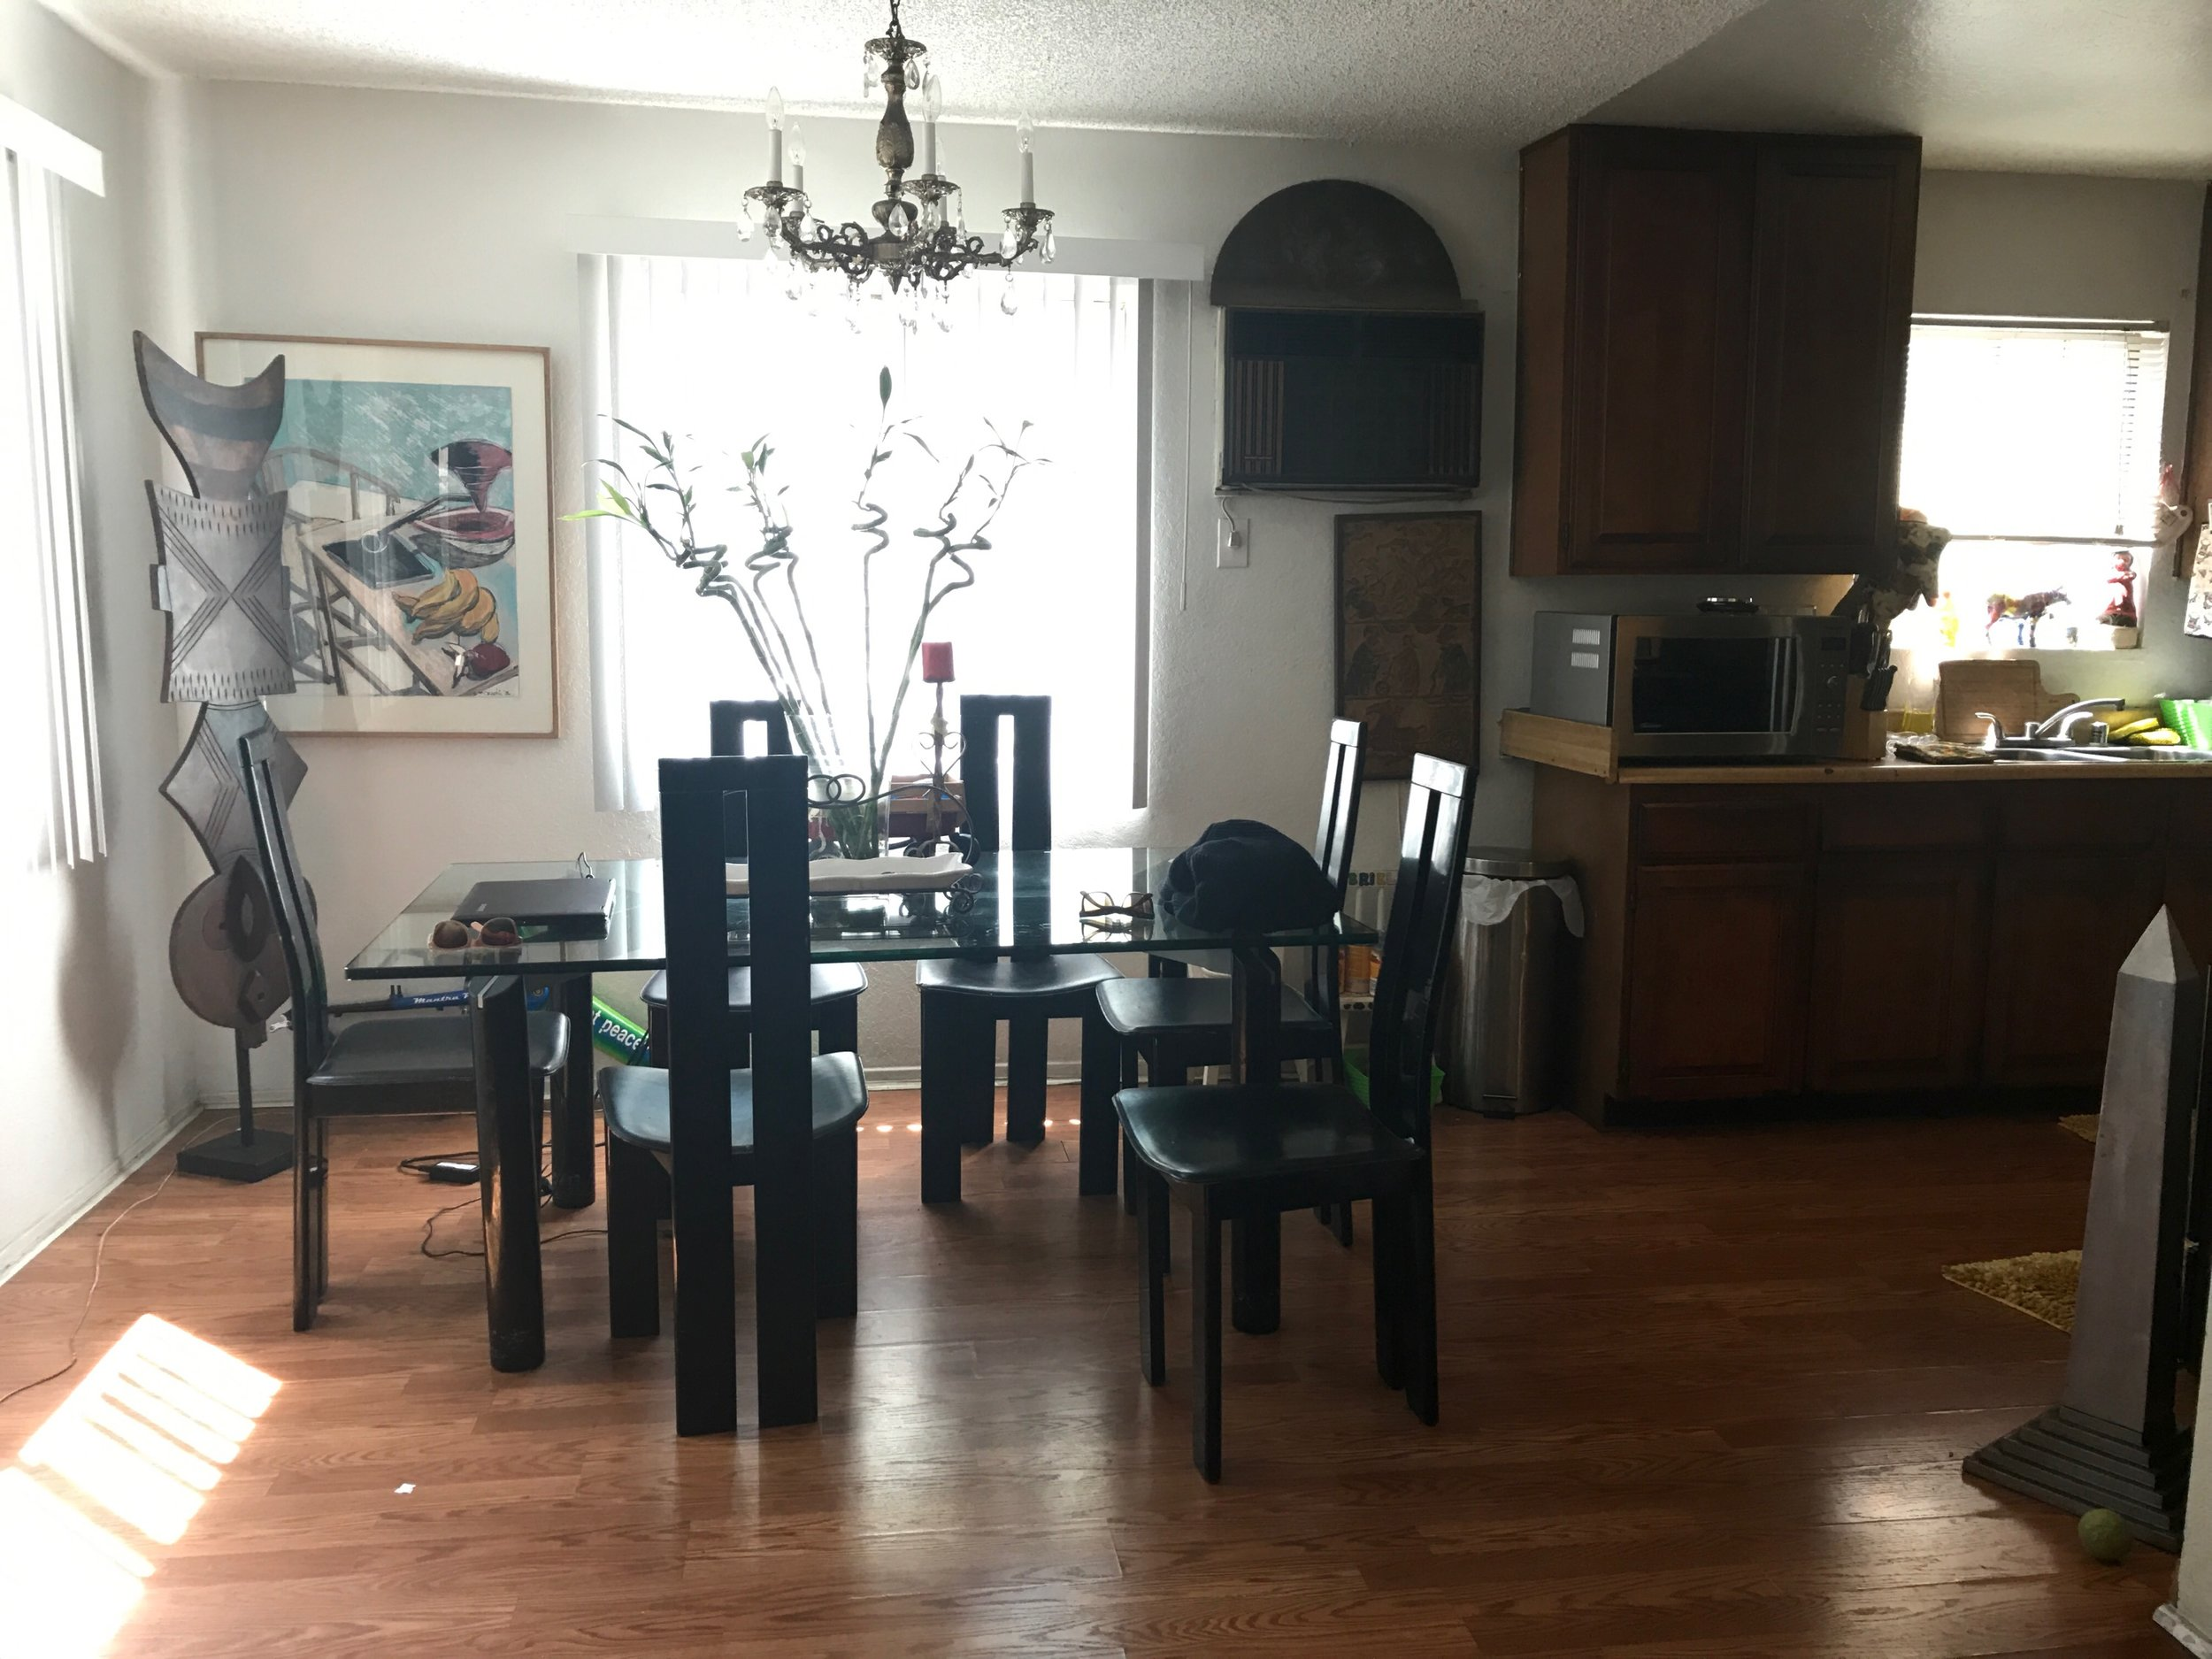 Sell your Silver Lake home - Silver Lake Realtor - Realtor David Bramante IMG_3001.JPG.jpeg